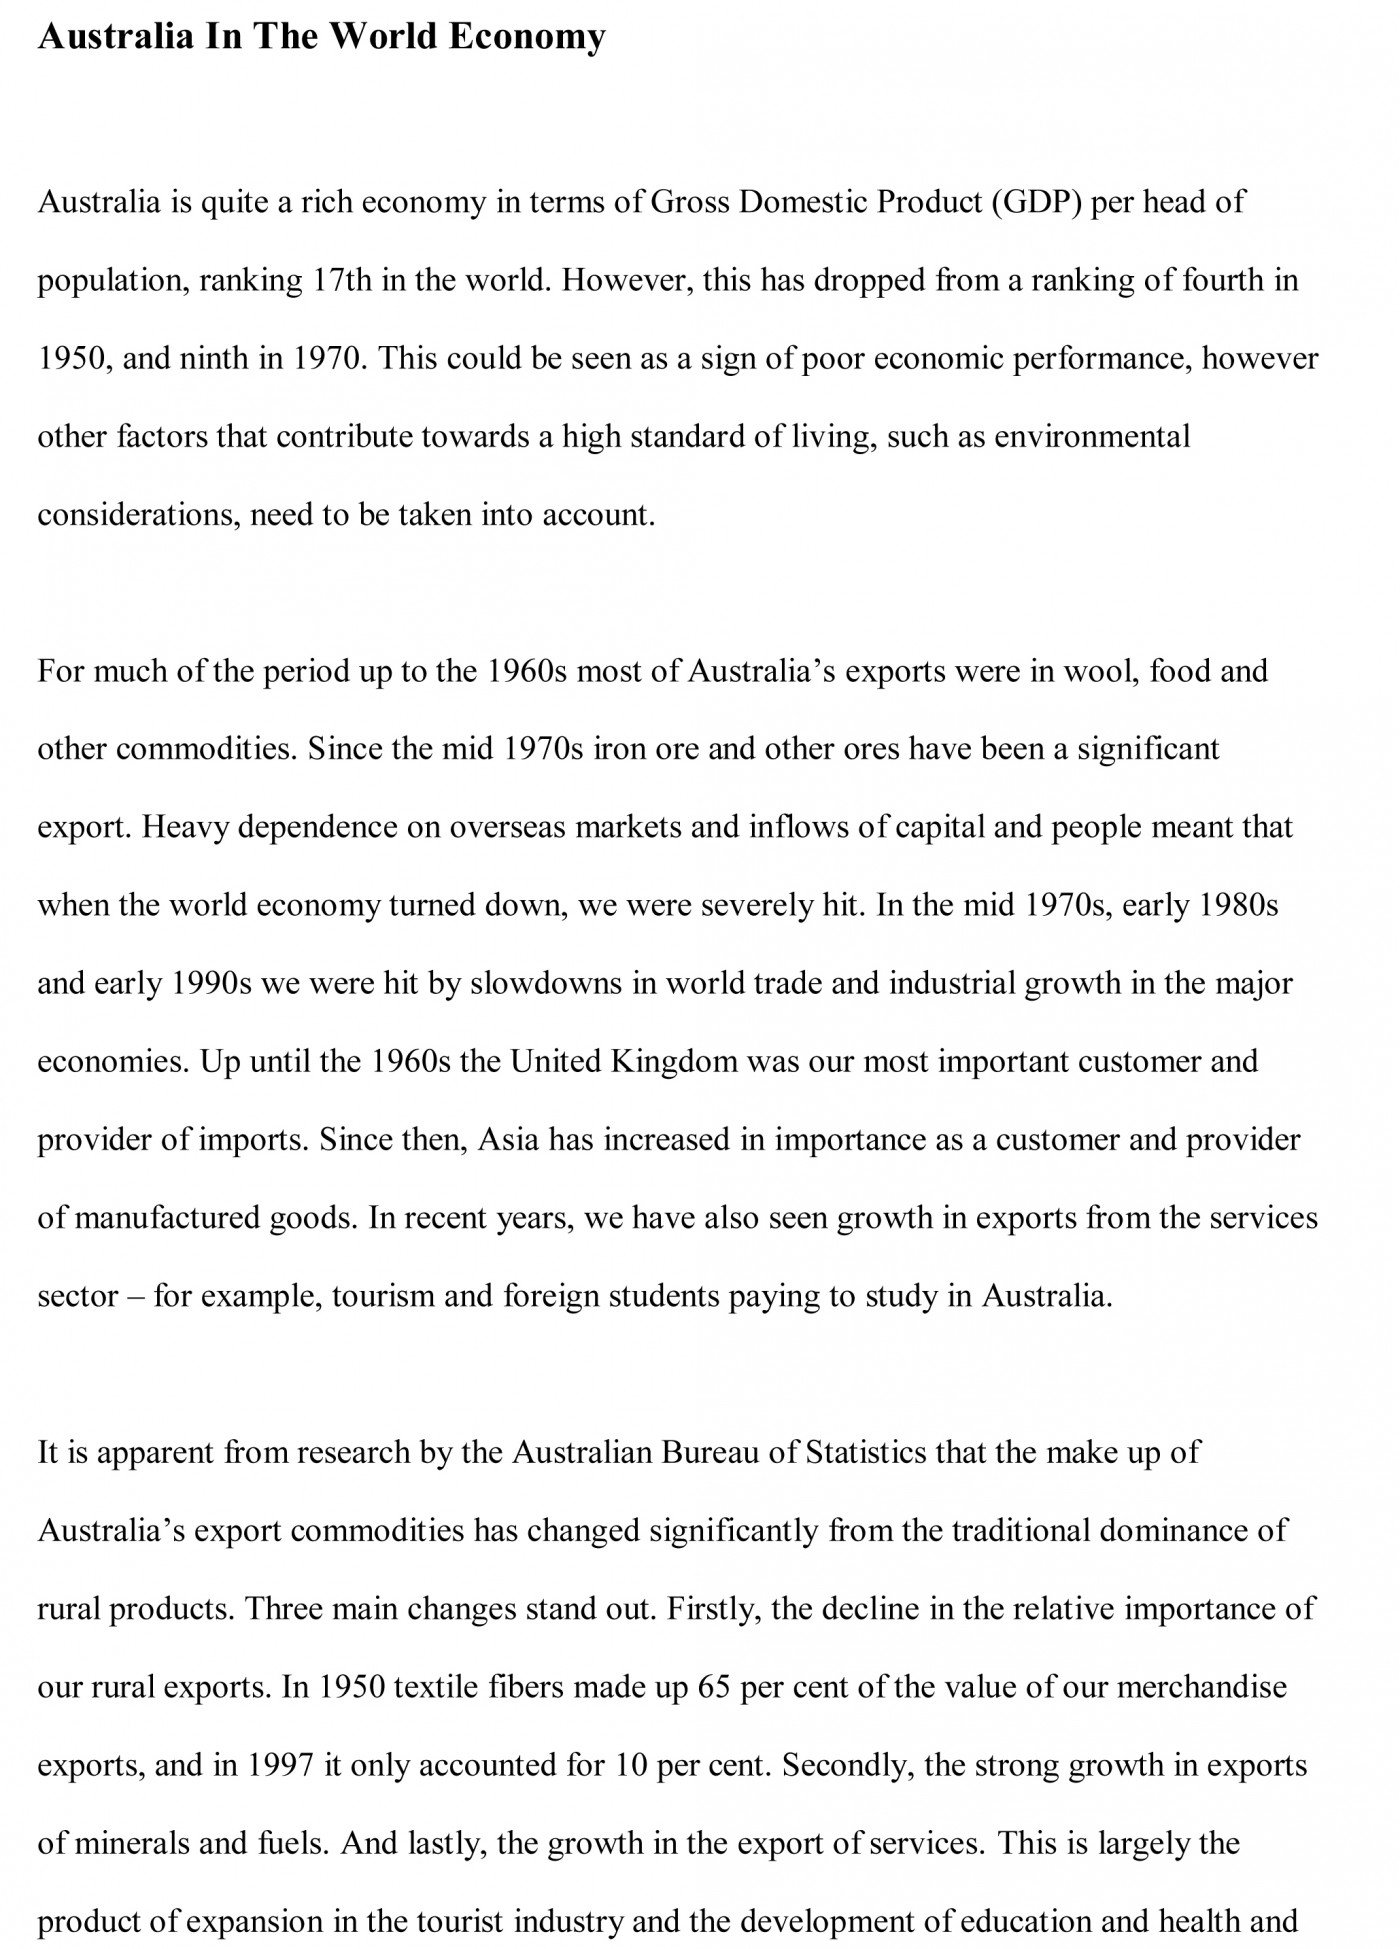 political opinion essay